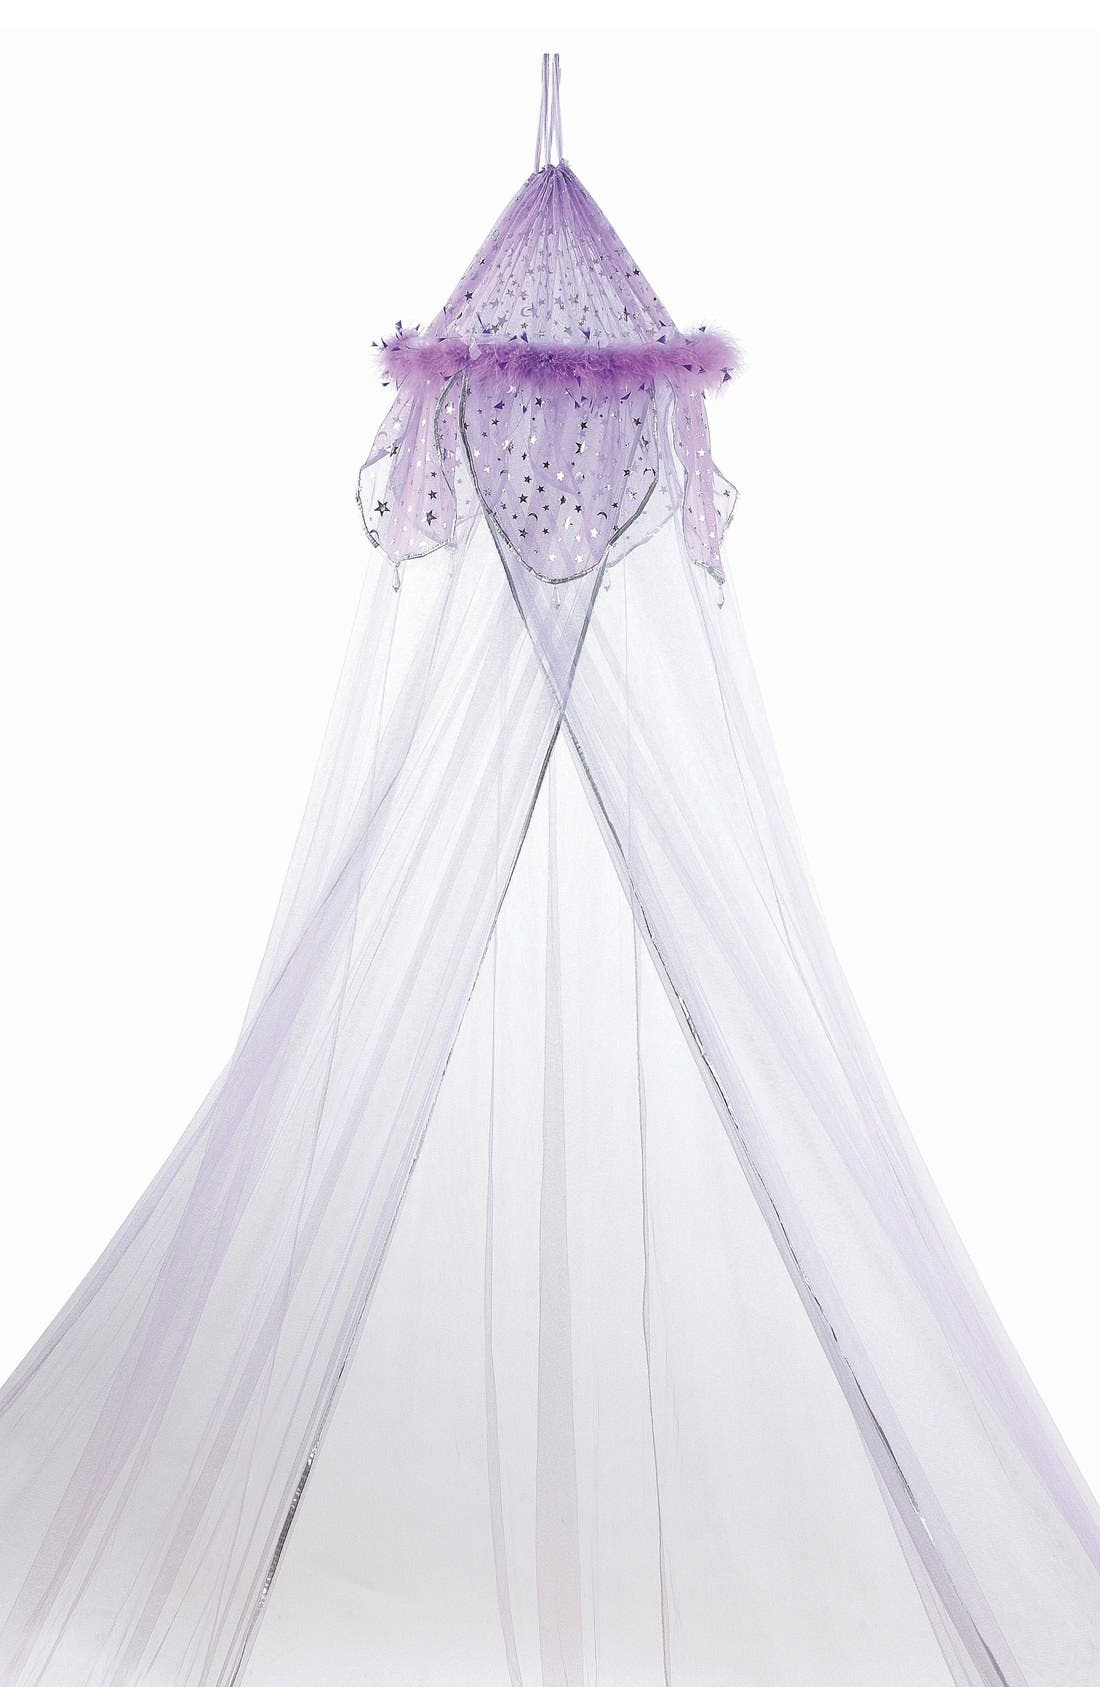 'Lavender Fantasy' Bed Canopy,                         Main,                         color, 500